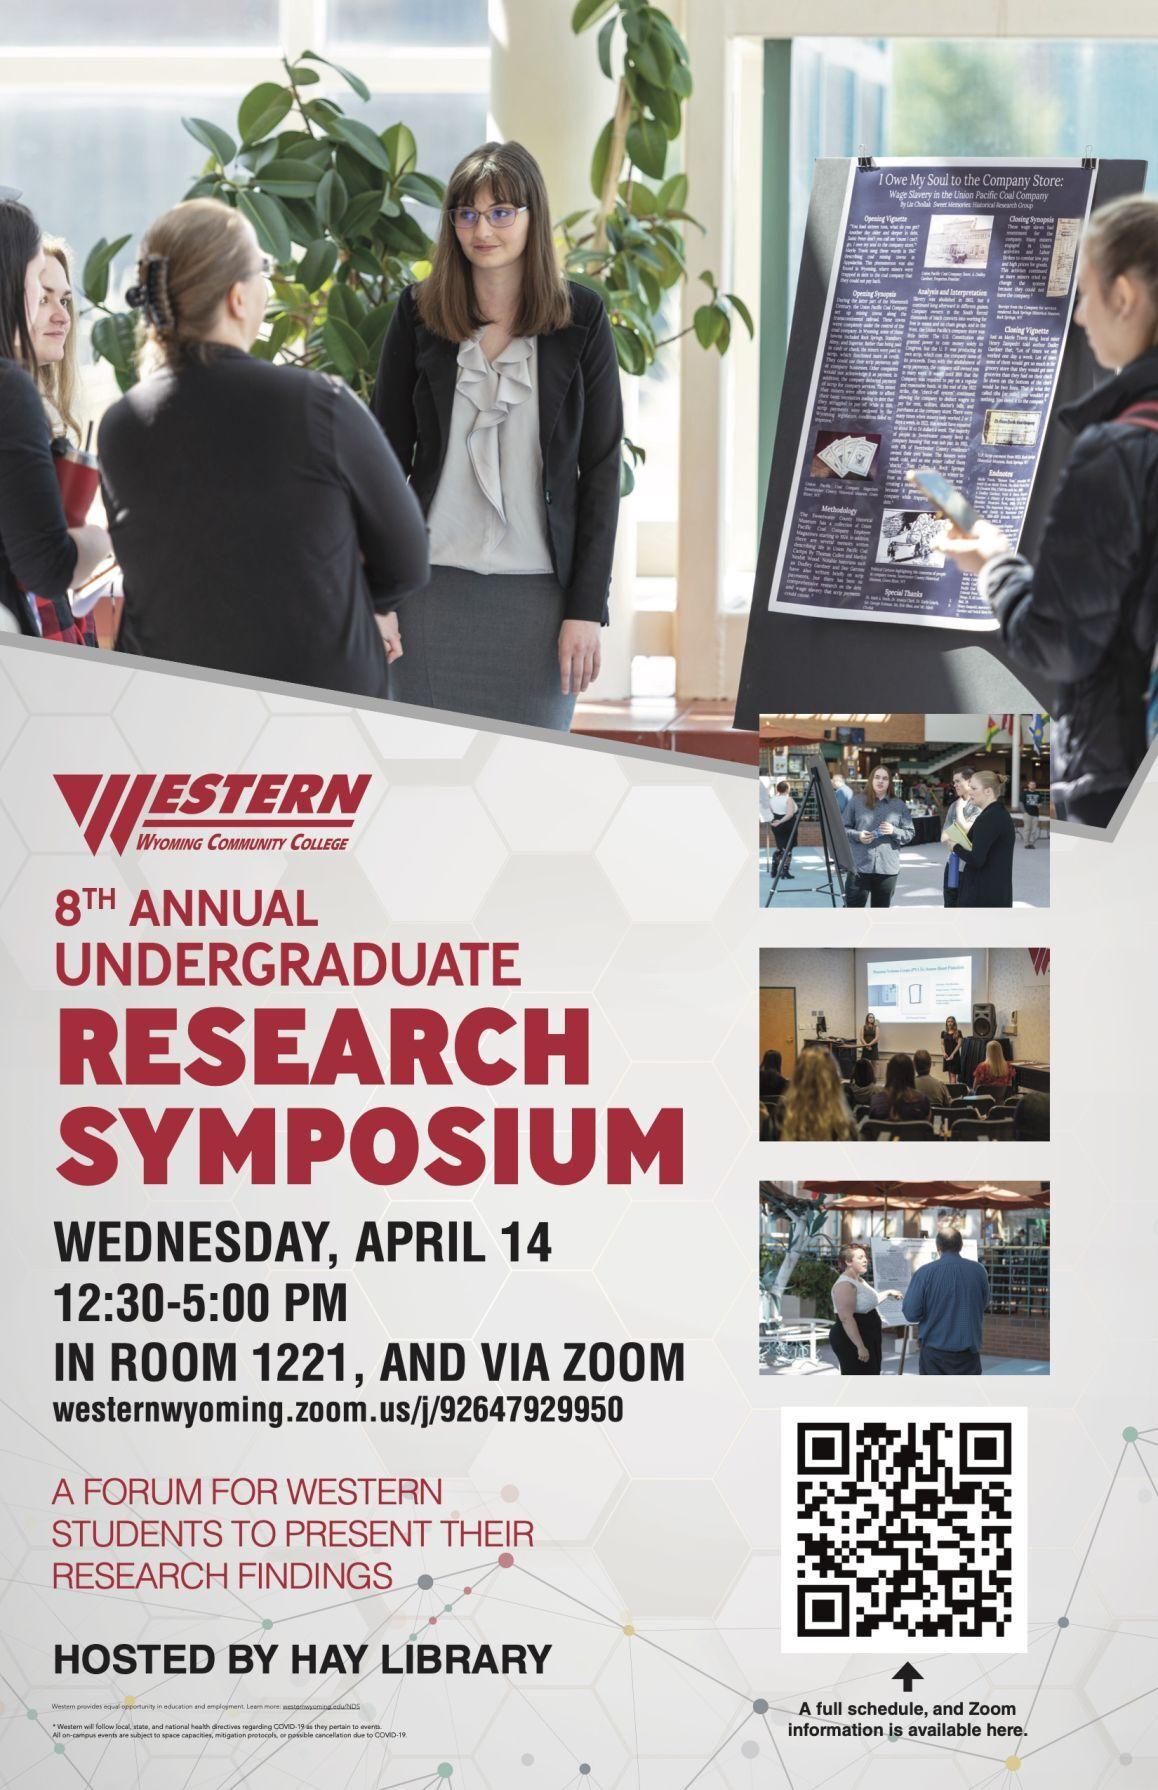 Western Research Symposium